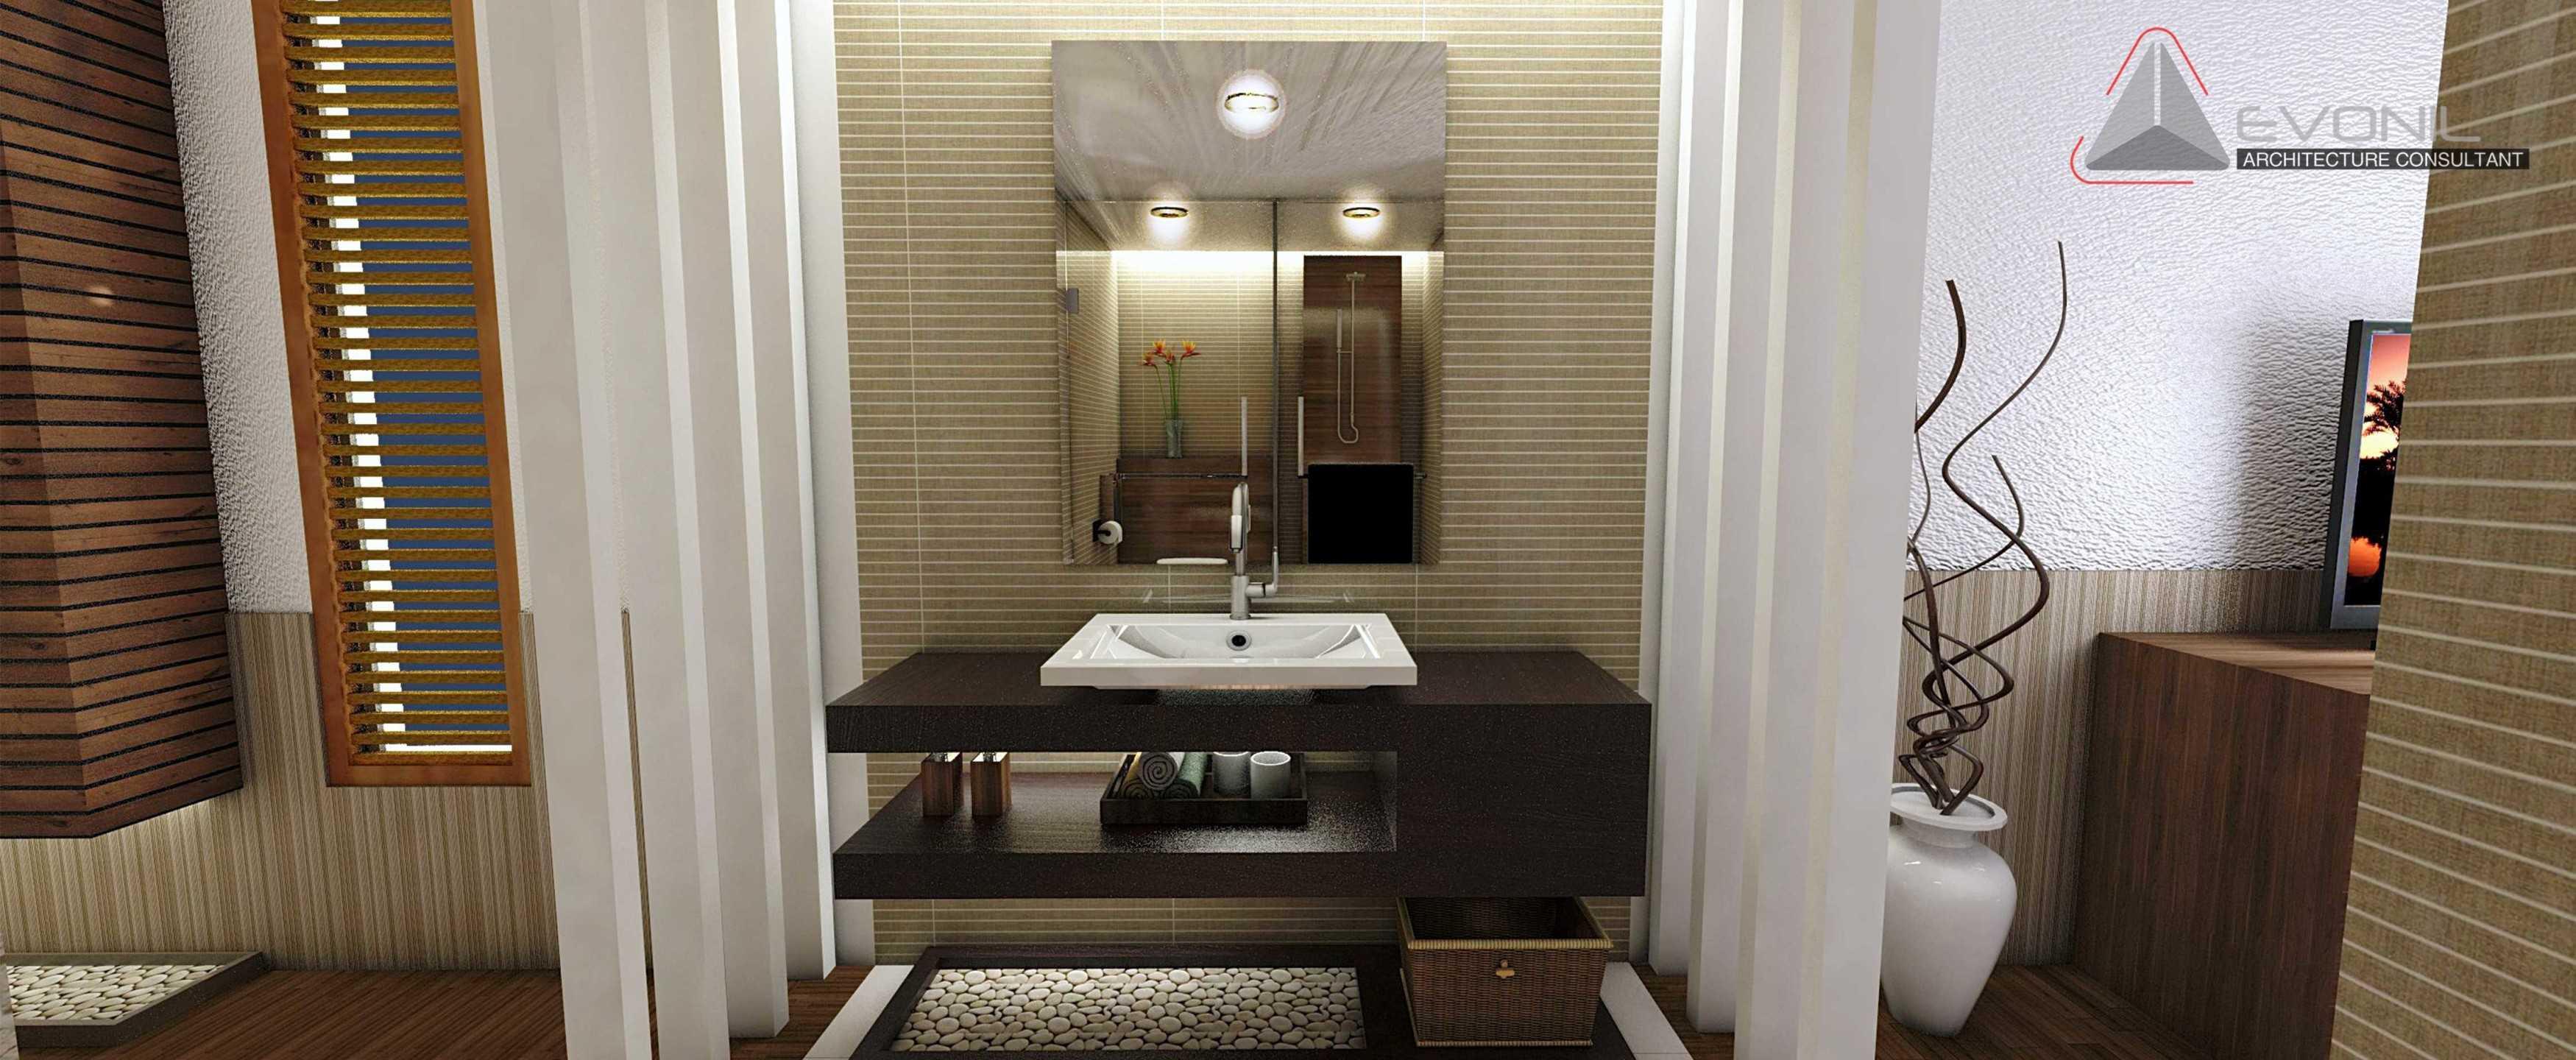 Evonil Architecture Residence Industri Jakarta, Indonesia Jakarta, Indonesia Bedroom-2Nd-Floor-Industri Asian  13013